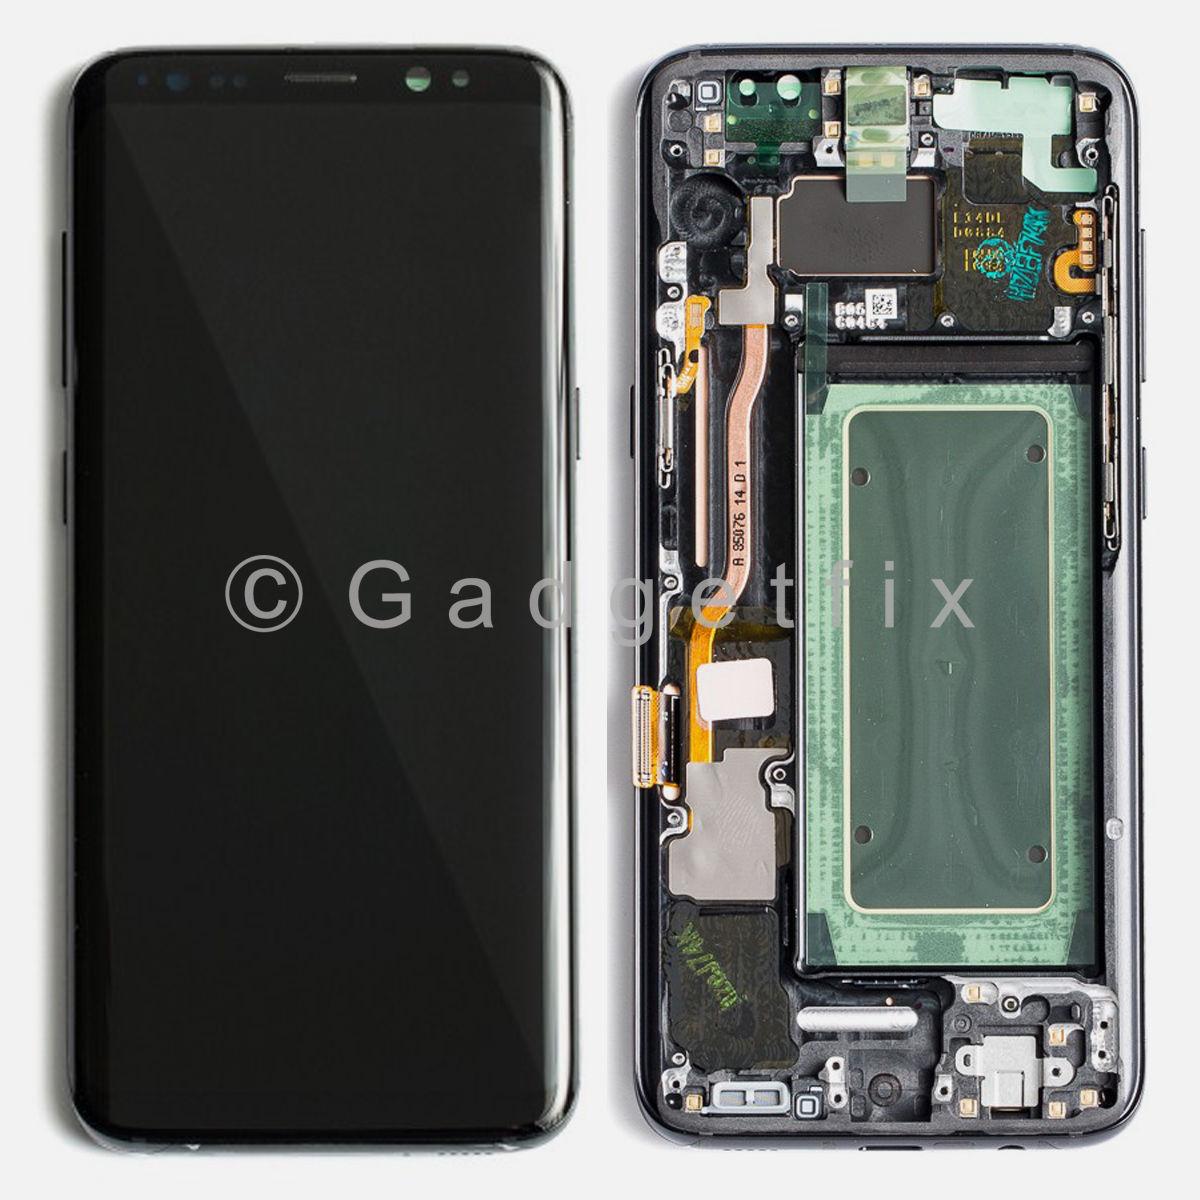 Genuine original samsung galaxy tab 3 8 0 original oem - Midnight Black Lcd Screen Touch Screen Digitizer Frame For Samsung Galaxy S8